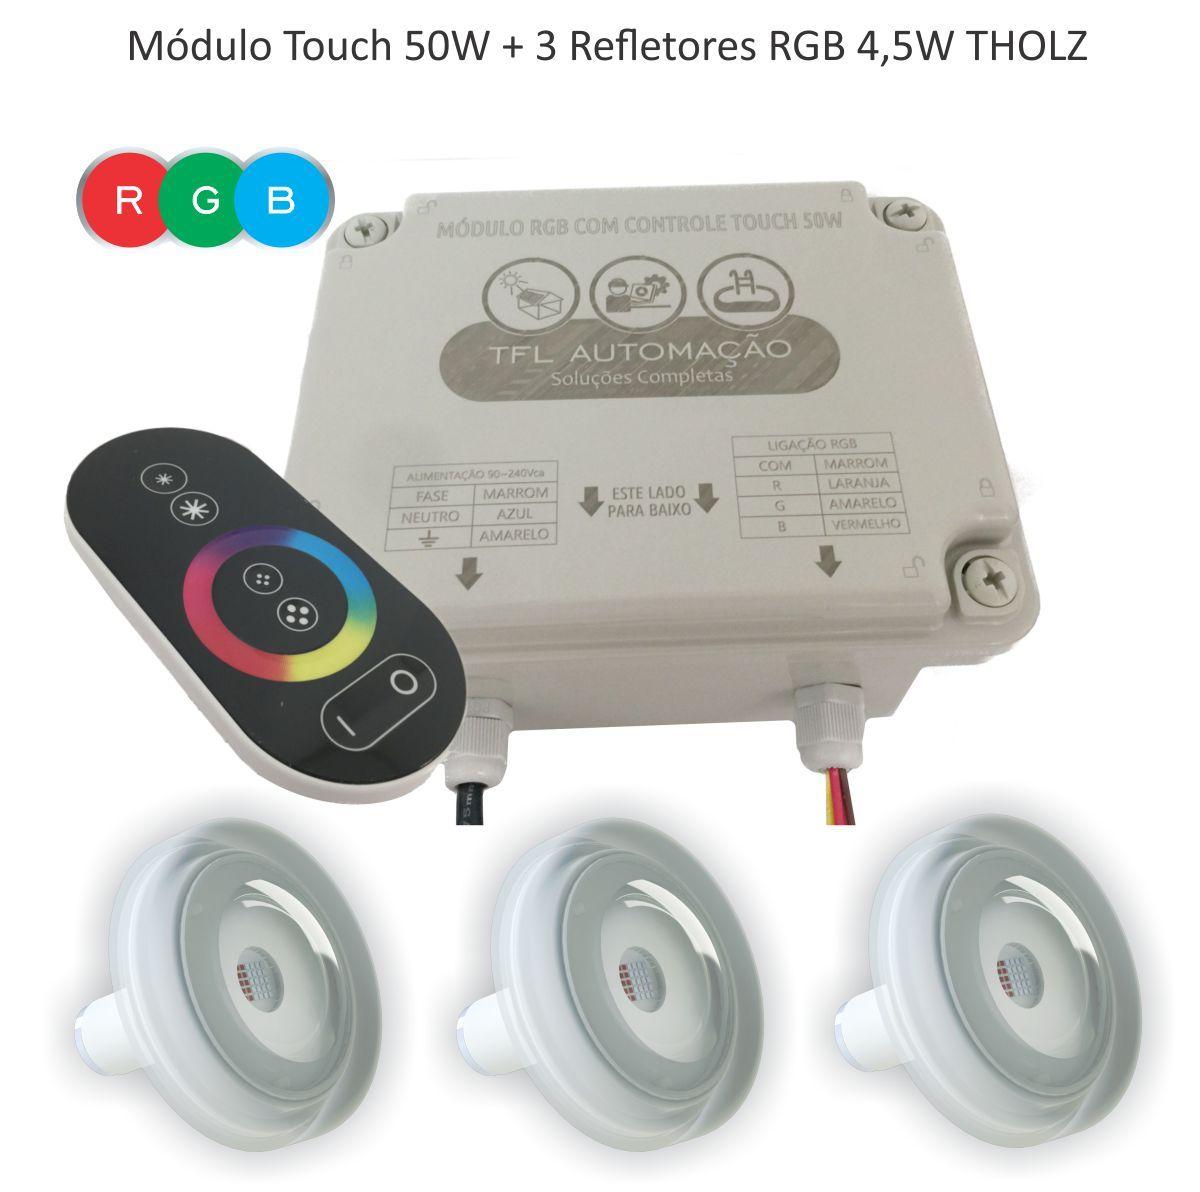 Kit Iluminação Piscina - 3 Leds Rgb 4,5w Tholz + Módulo c/ Controle Touch 50w